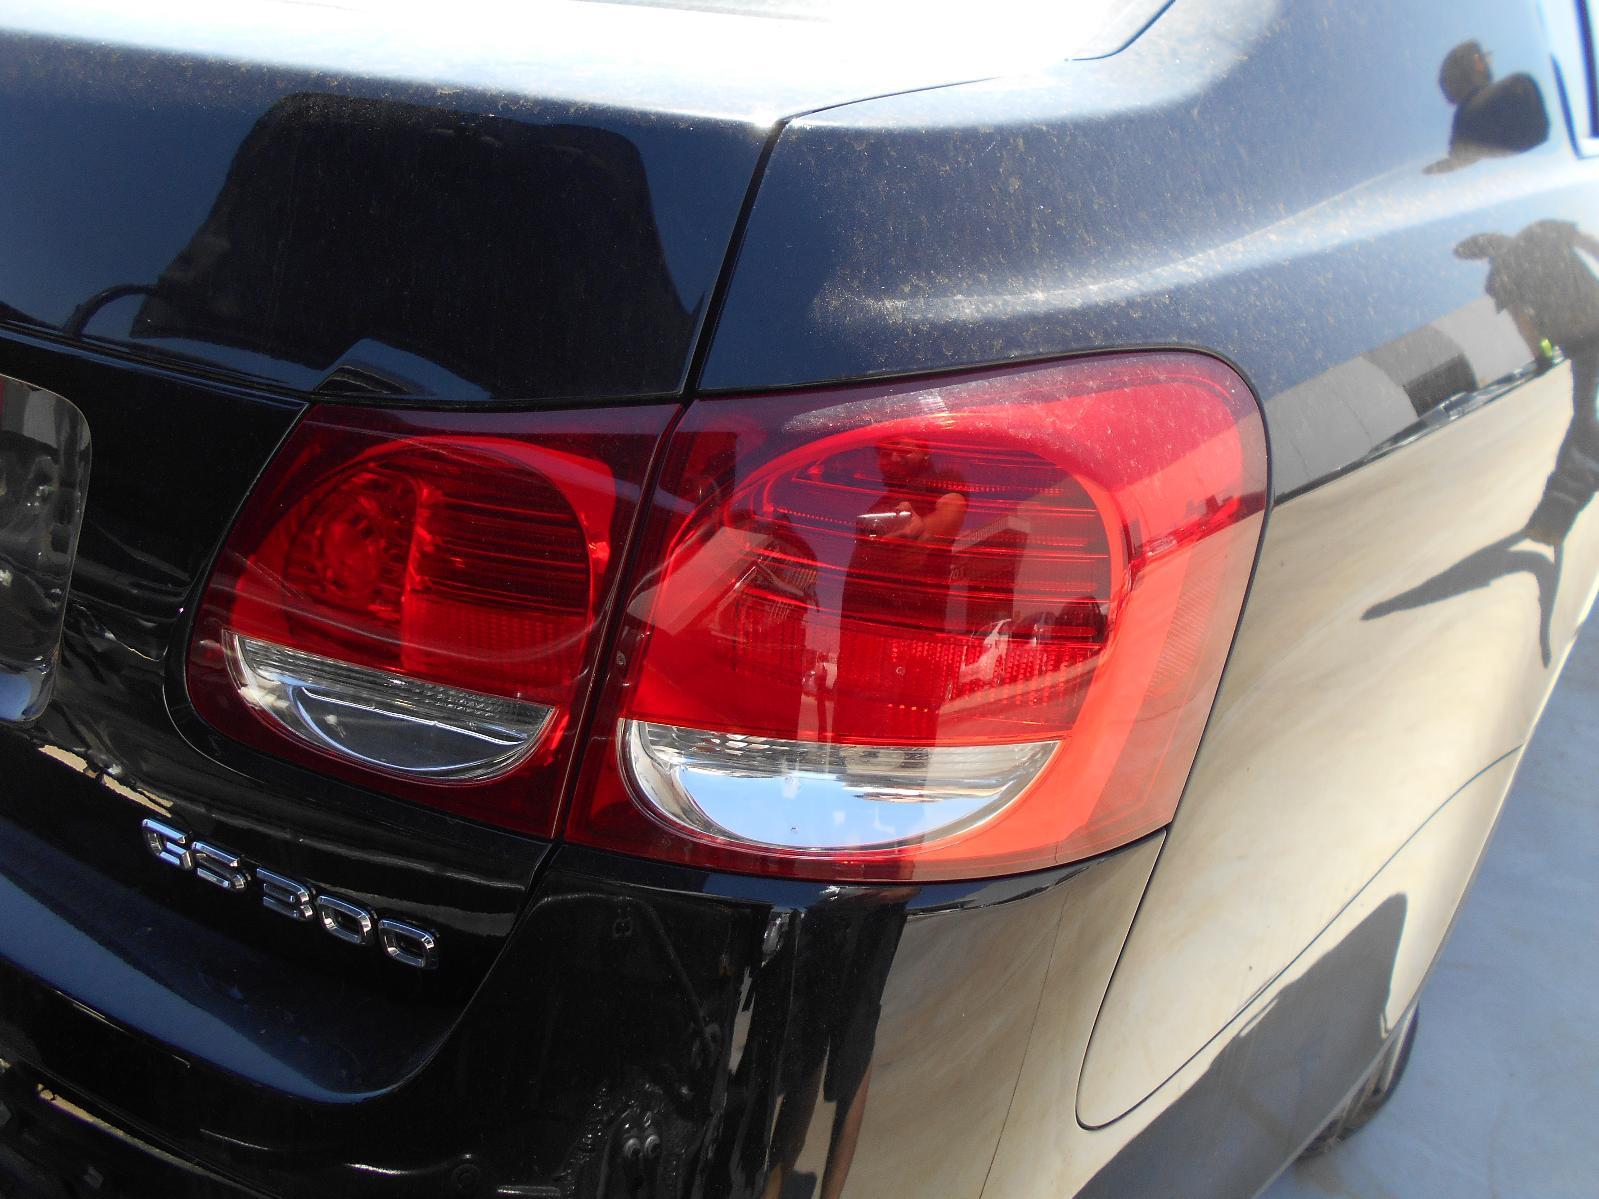 LEXUS GS, Right Taillight, GS300/GS430/GS460, 190 SERIES, 03/05-12/11